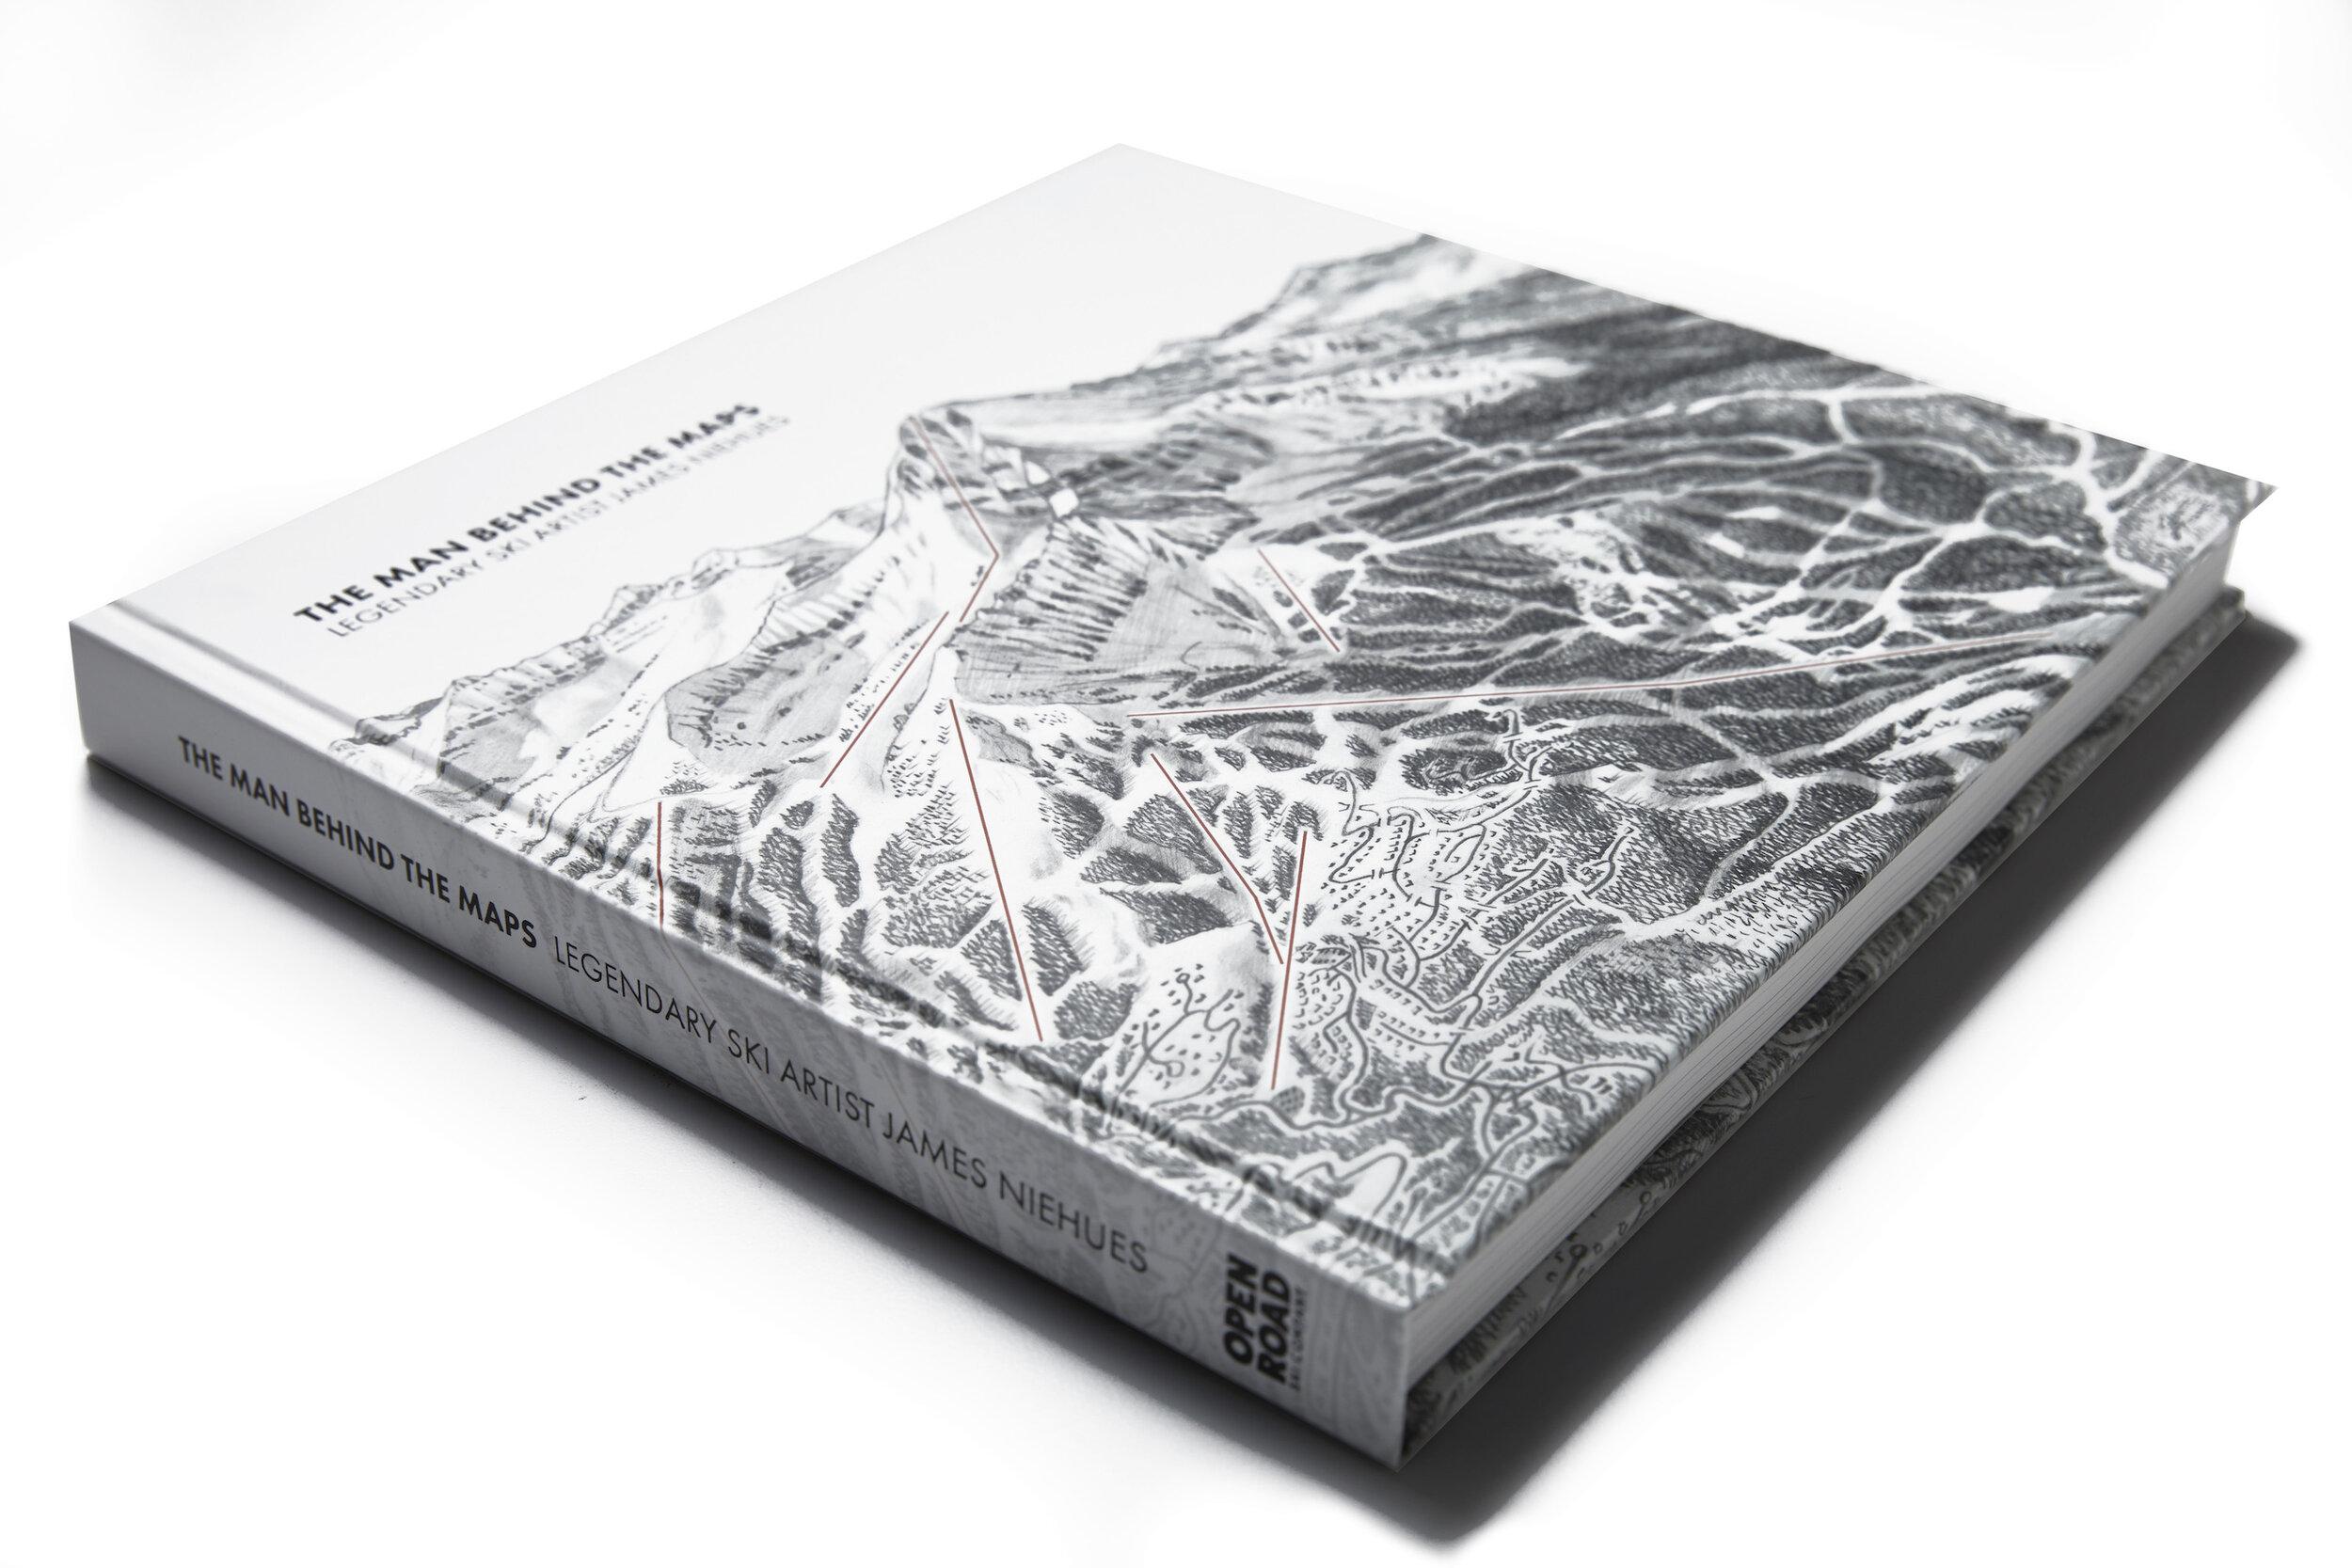 James Niehues The Man Behind The Ski Maps Book-on_wht_3170.jpg